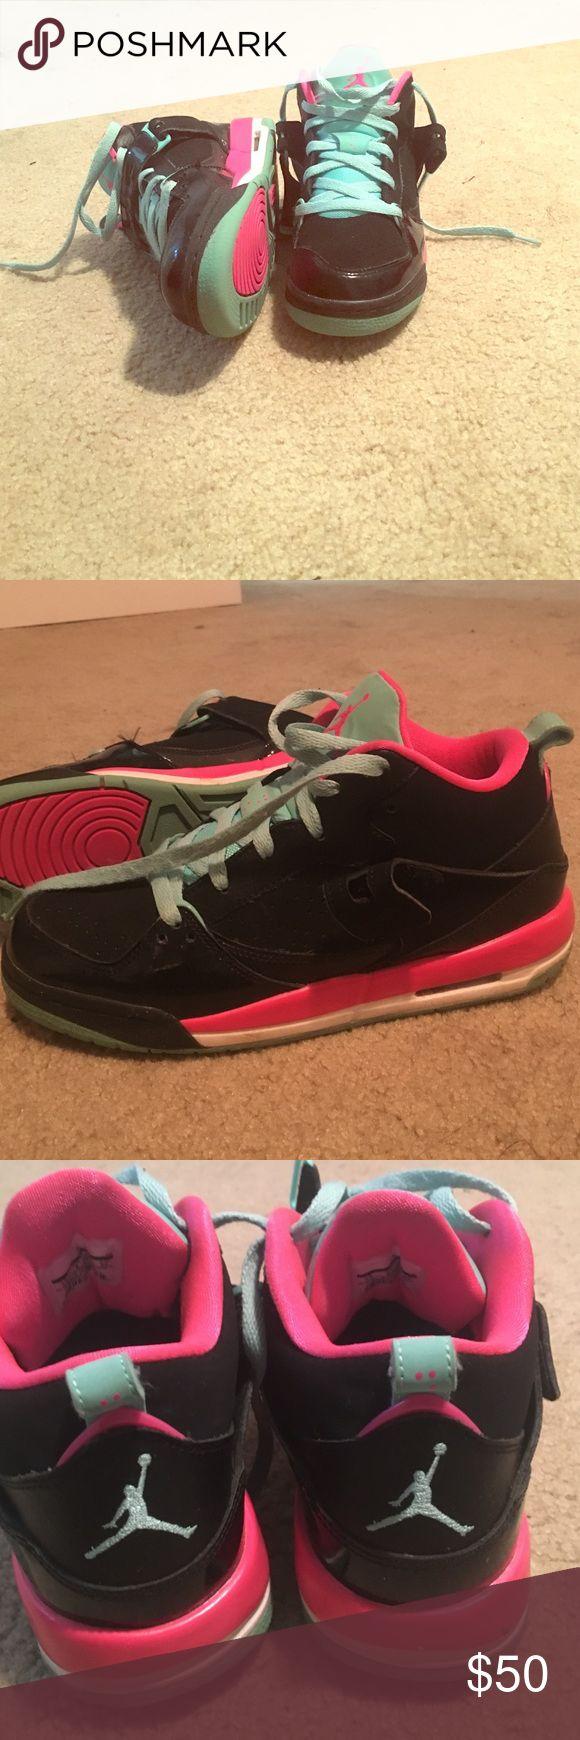 Girls black pink and teal Jordan sneakers Cute girls Jordan sneakers. Girls/boys size 7 which is = to women's size 8. Jordan Shoes Athletic Shoes